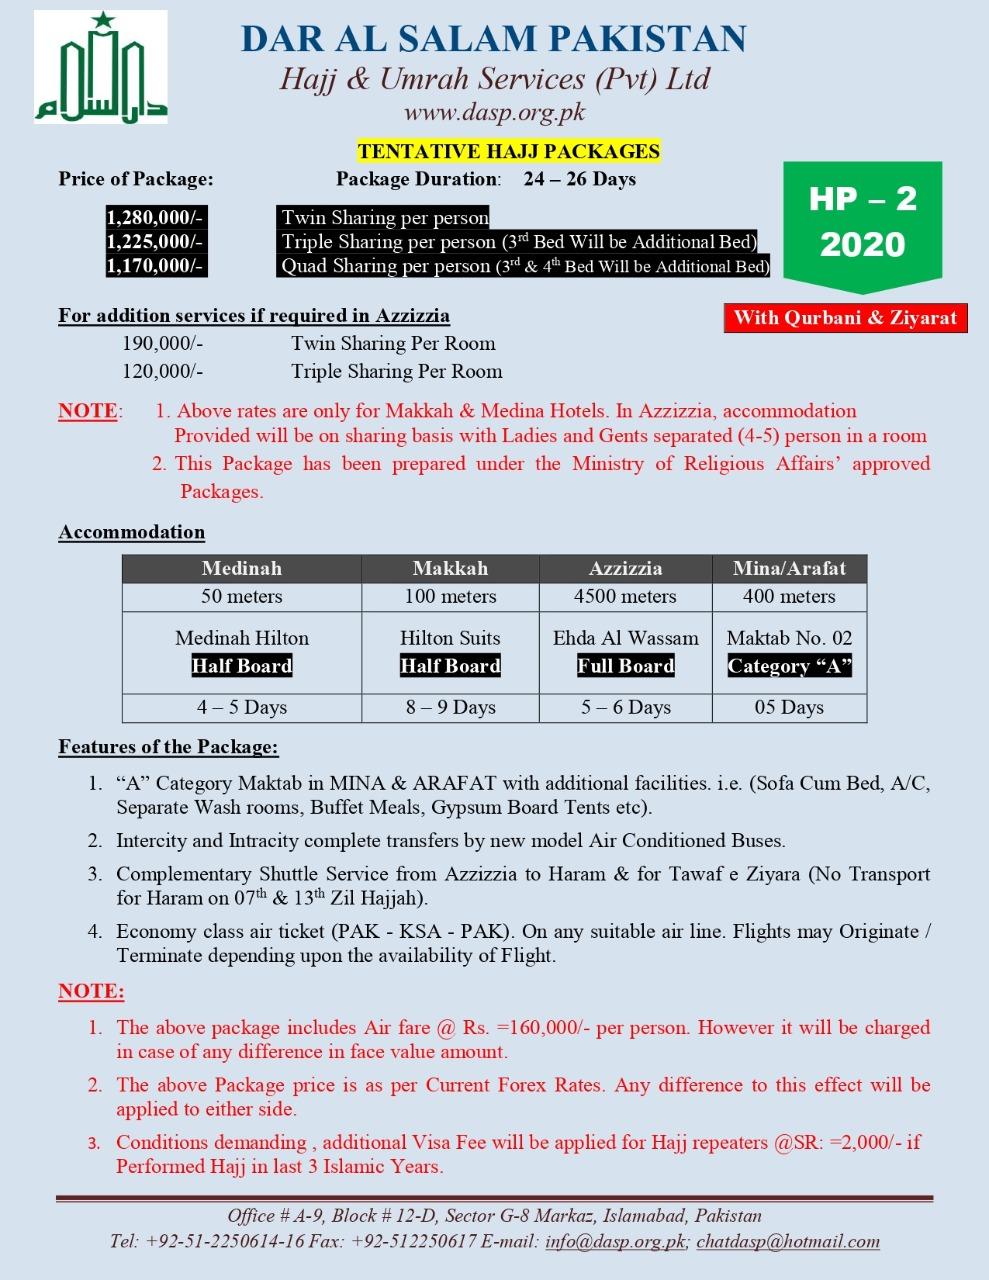 Private Hajj Package 2020 Pakistan Price